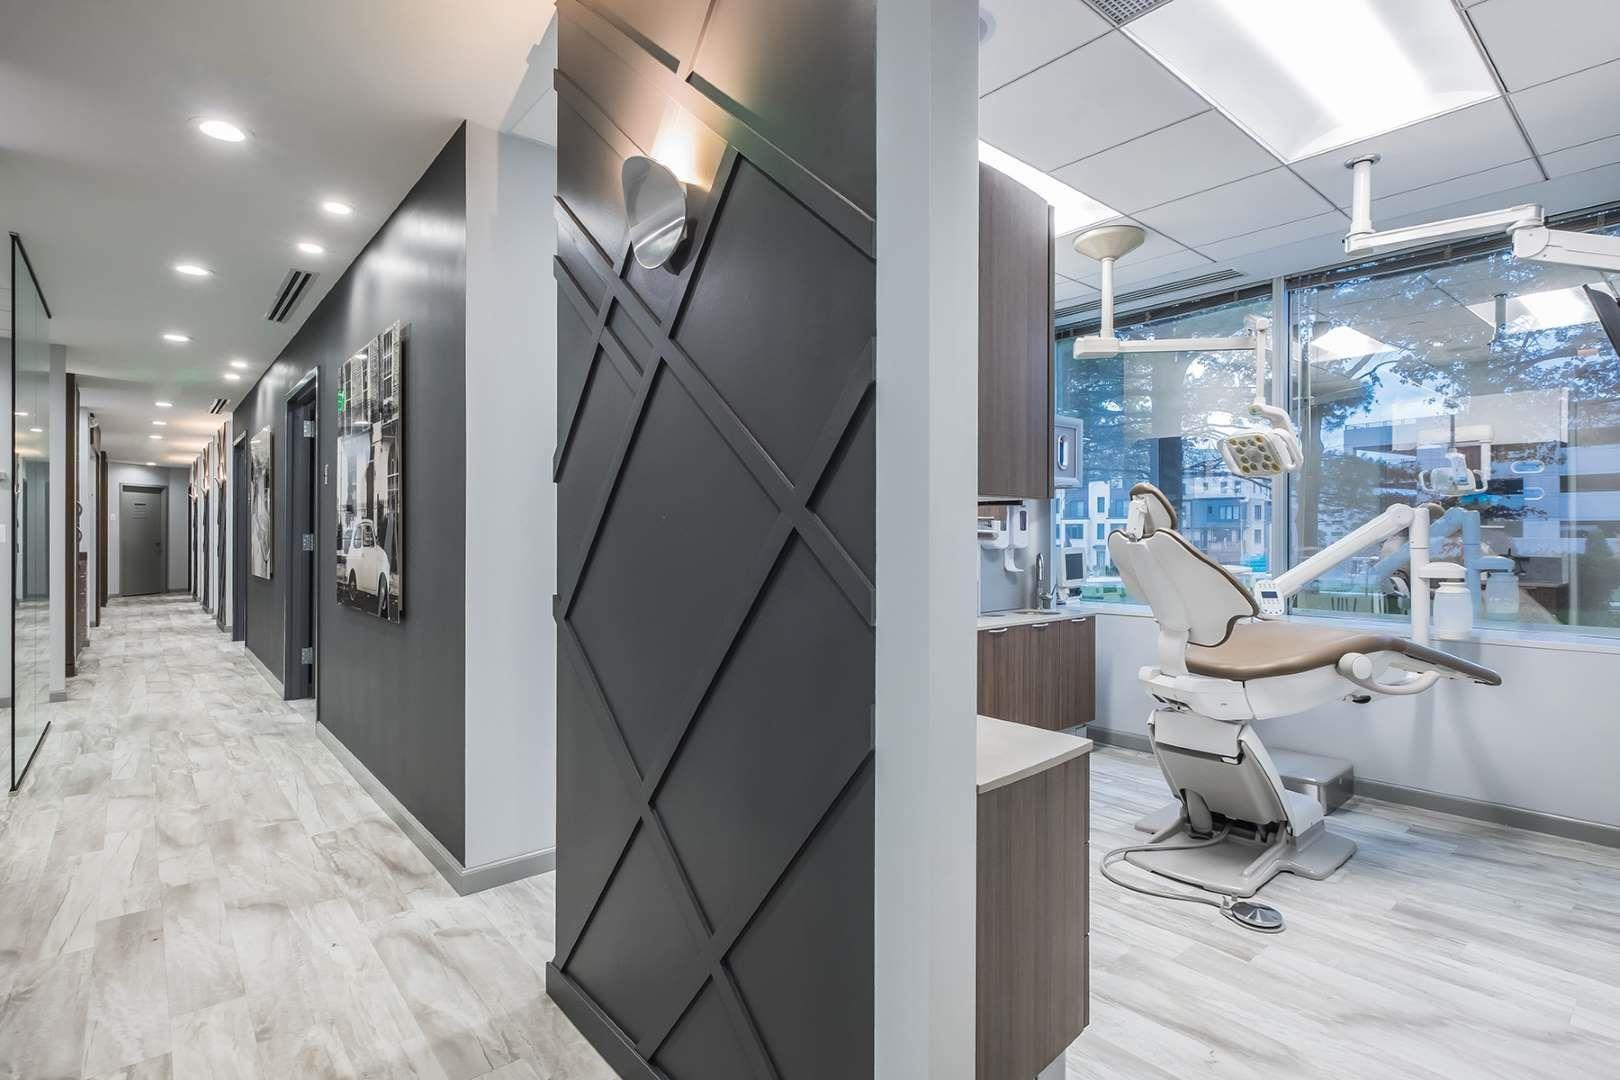 Bethesda Sedation Dentistry Interior Design Portfolio Dental Office Design Interiors Dentist Office Design Interiors Dental Office Decor